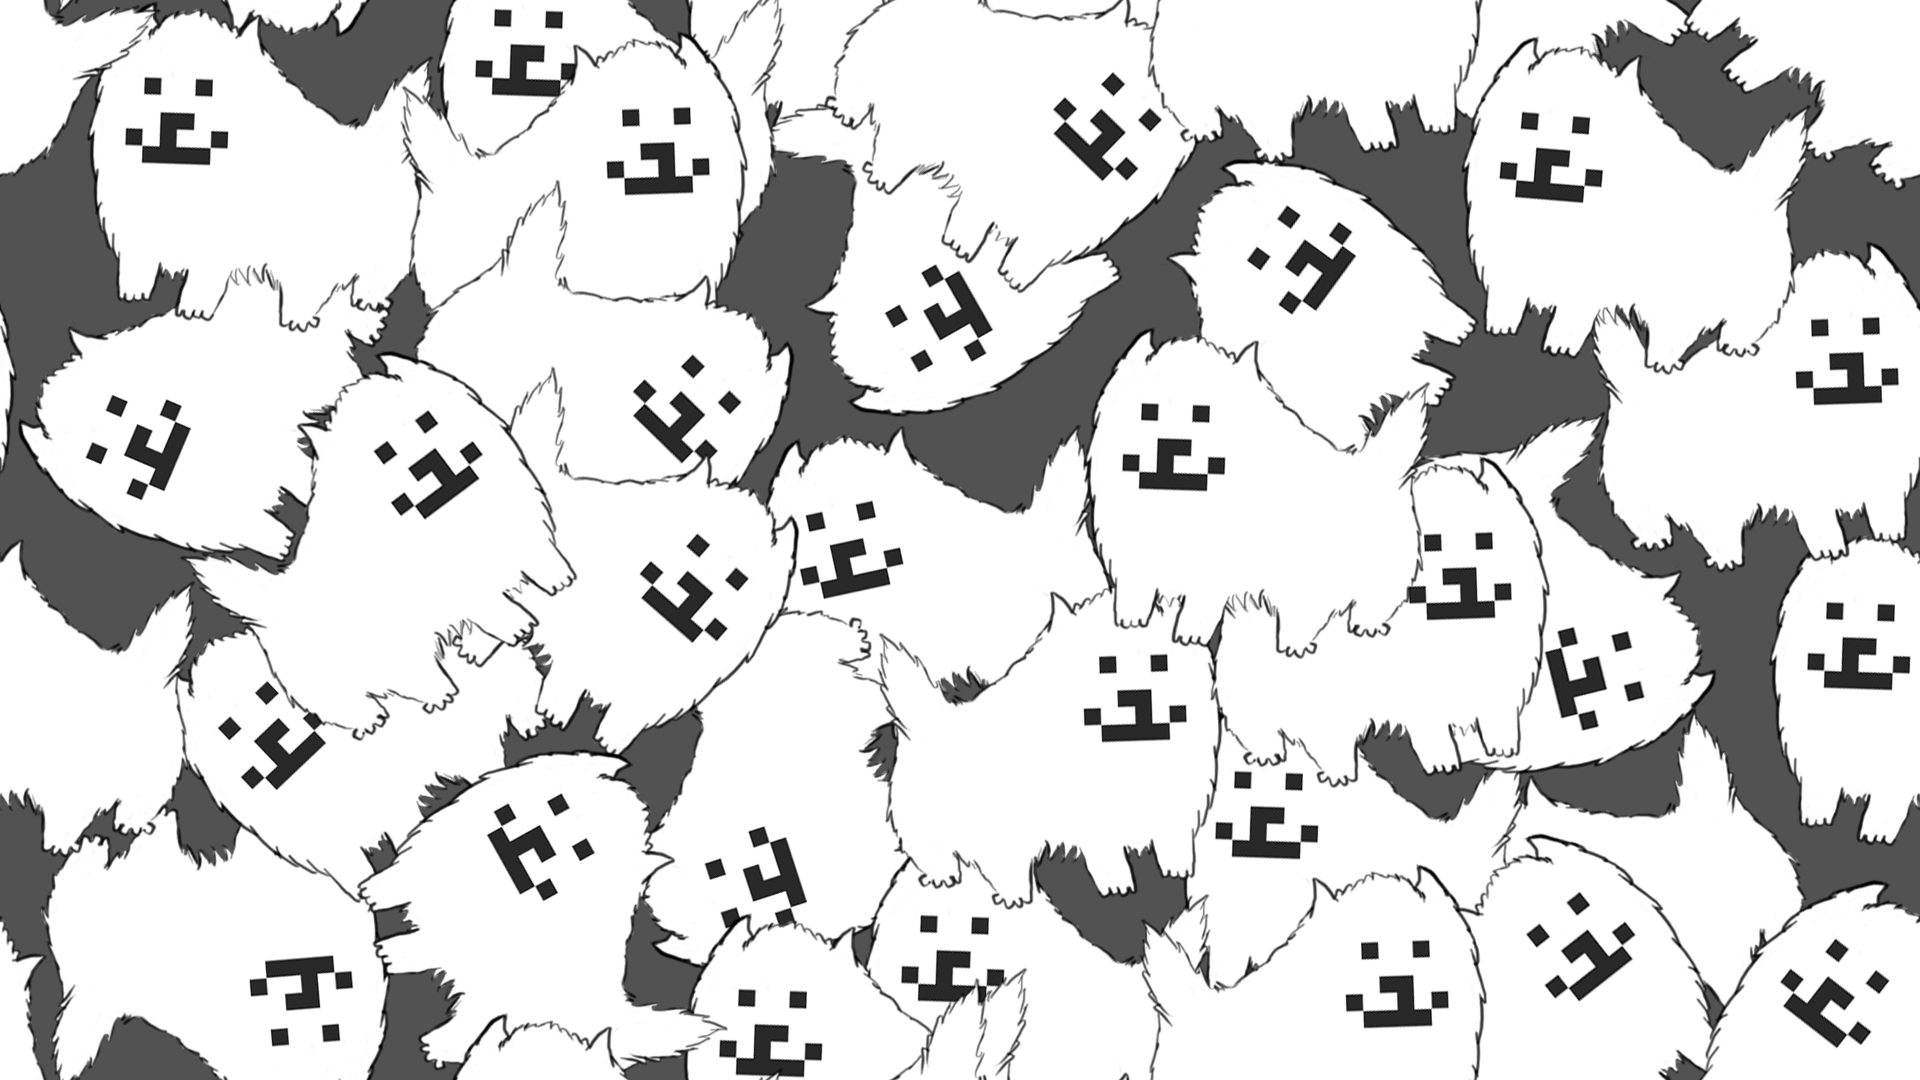 Undertale Wallpaper Google Search Undertale Dog Undertale Character Wallpaper